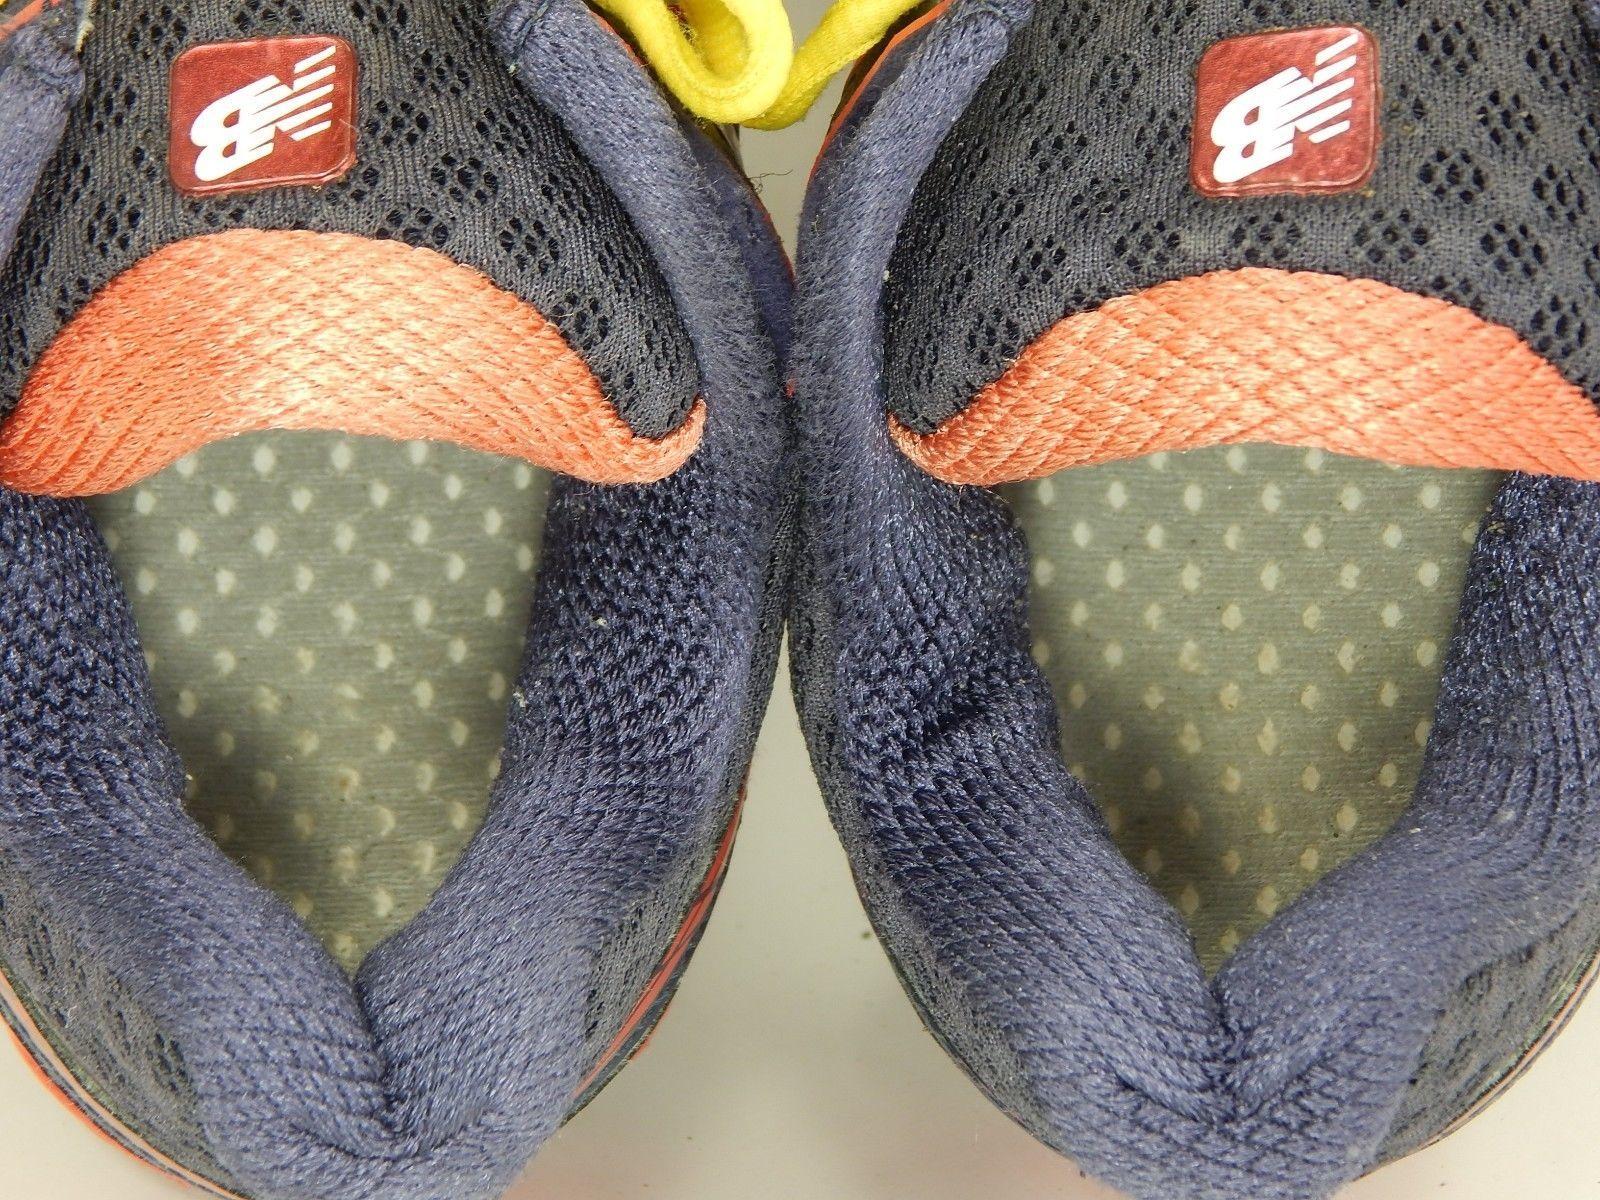 New Balance 890 v 2 Barringer Size 9 M (B) EU 40.5 Women's Running Shoes W890GH2